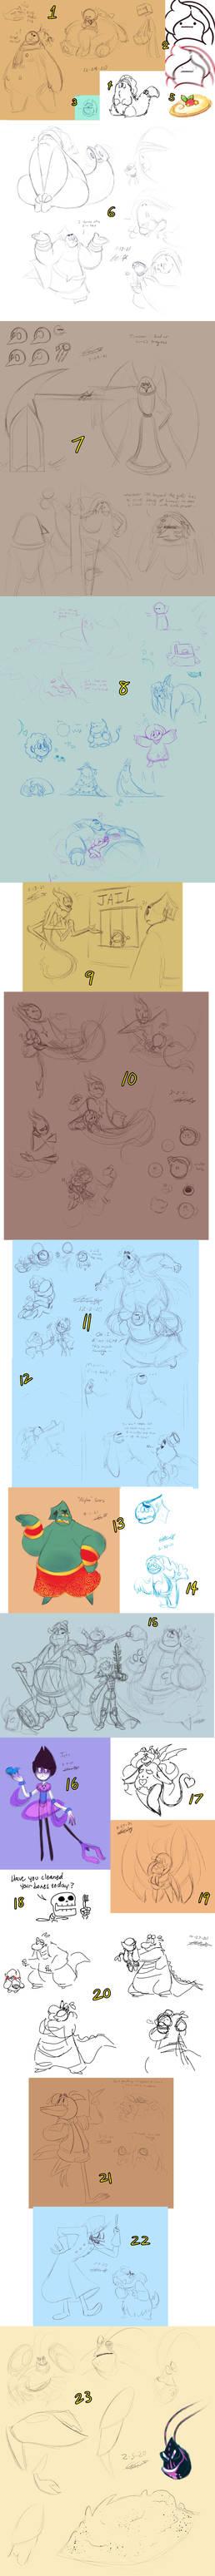 Sketch Dump 4-8-21